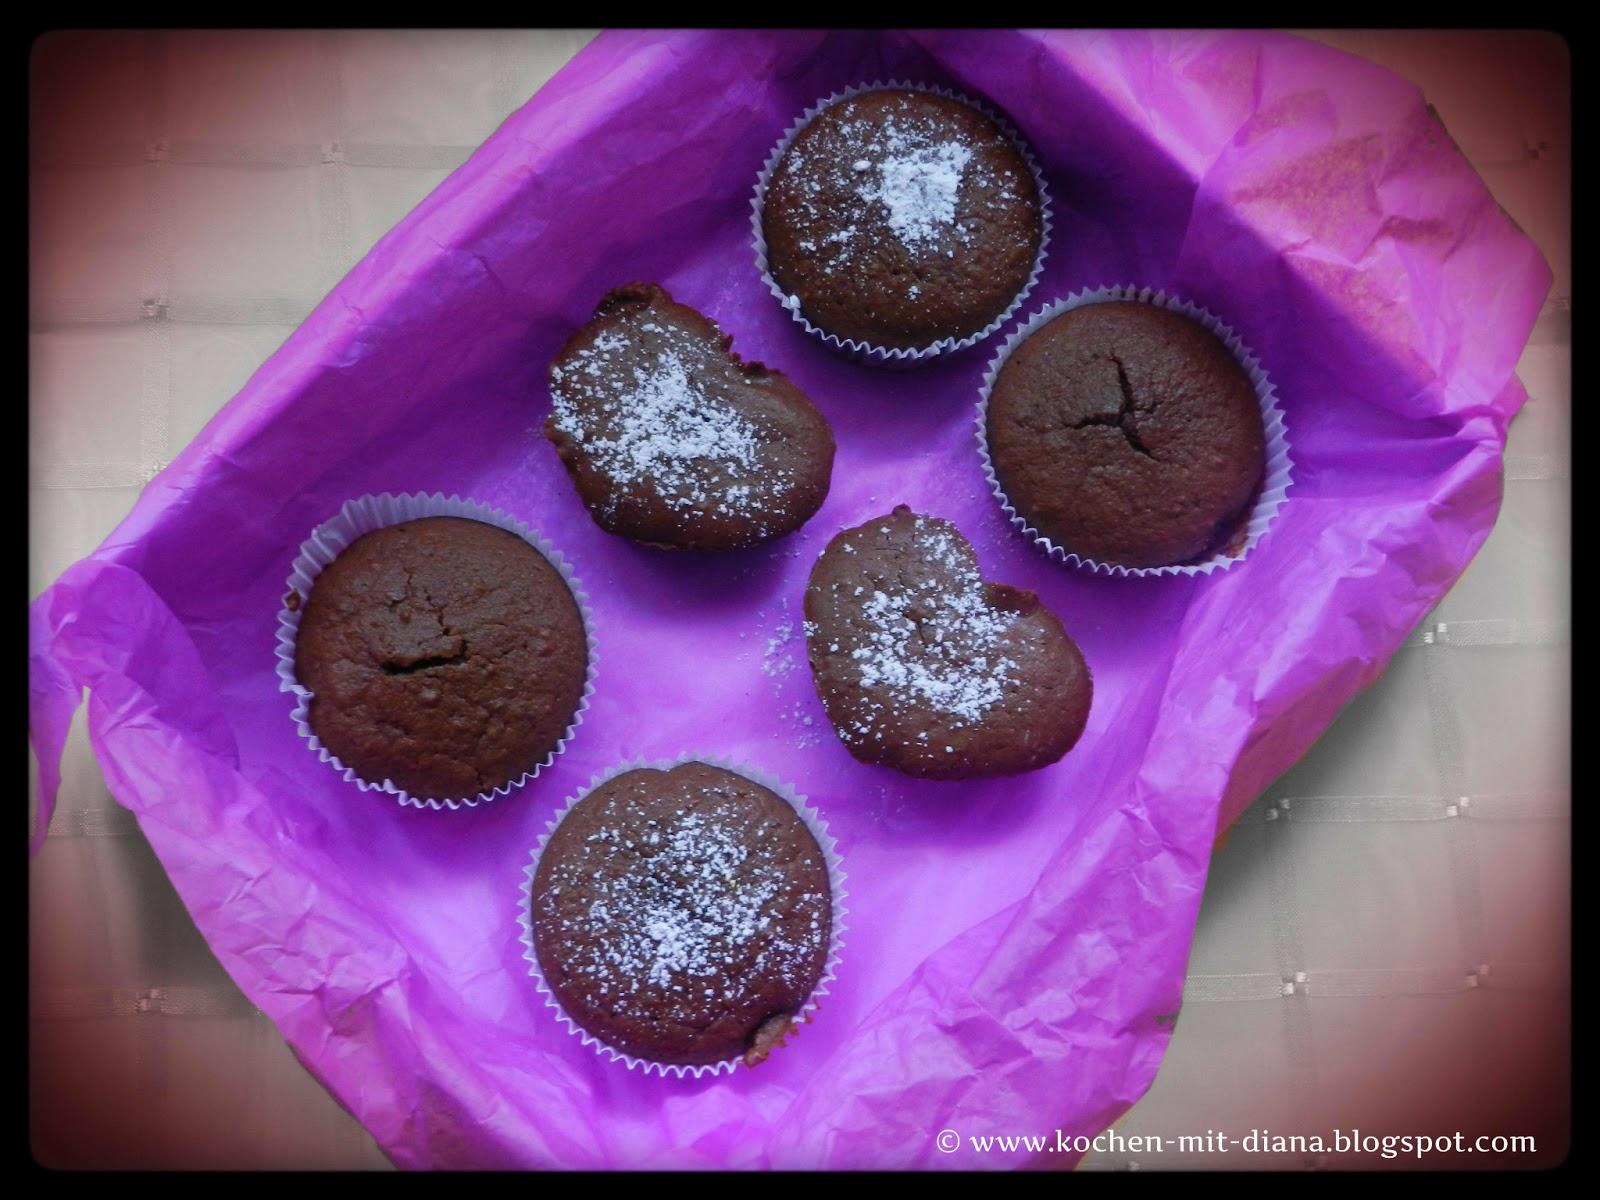 Amaretto-Schoko-Muffins